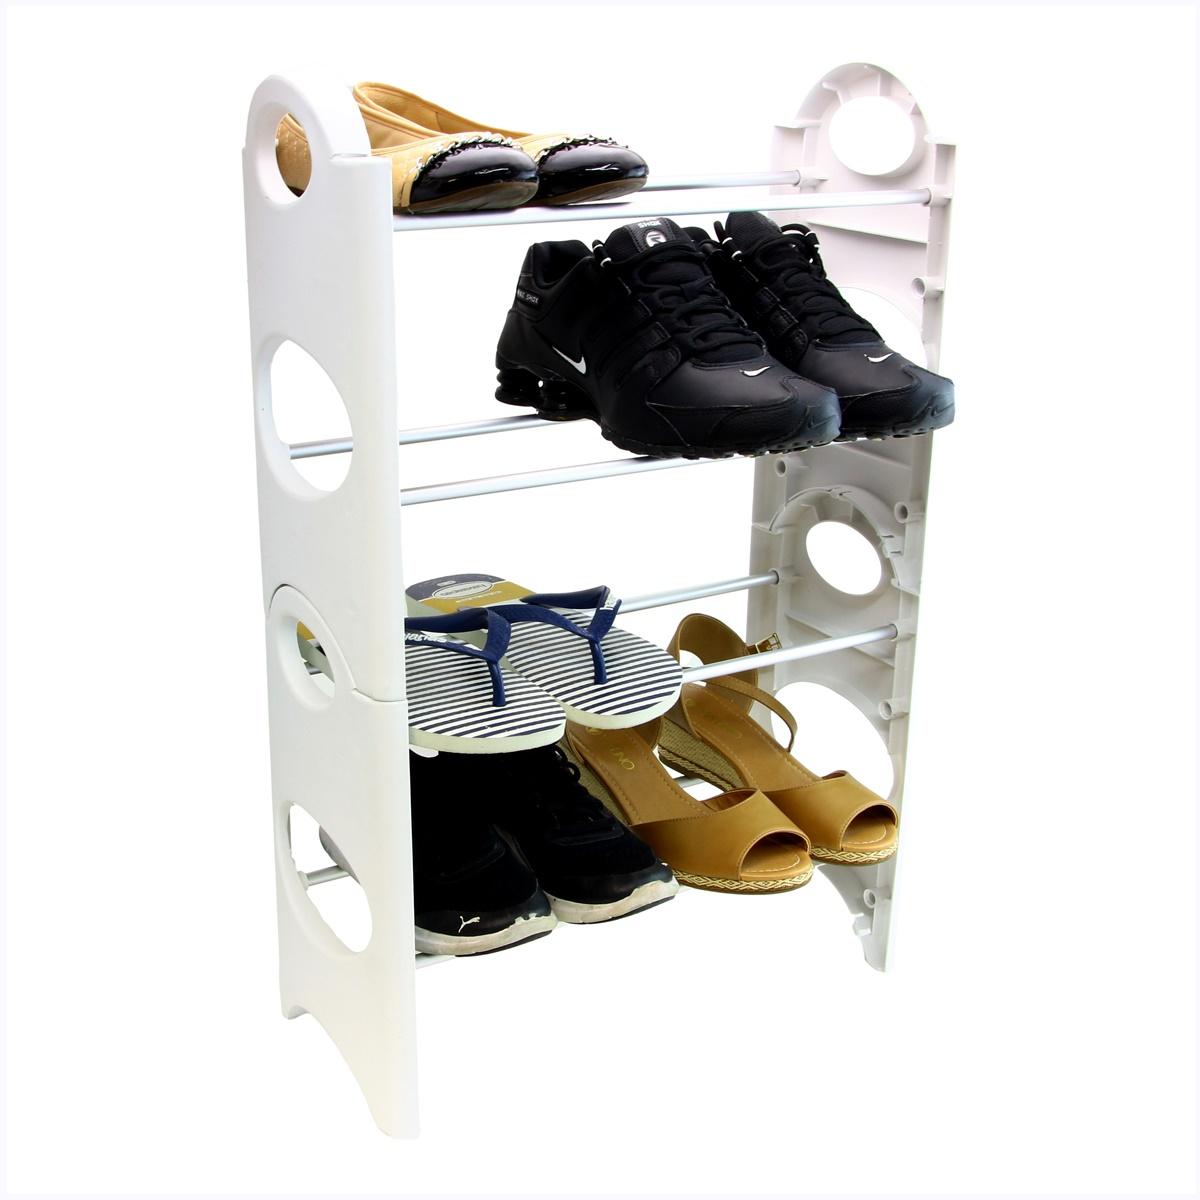 Sapateira Para Hall De Entrada Porta varias cores 16 Sapatos SAP-4A-8P-N